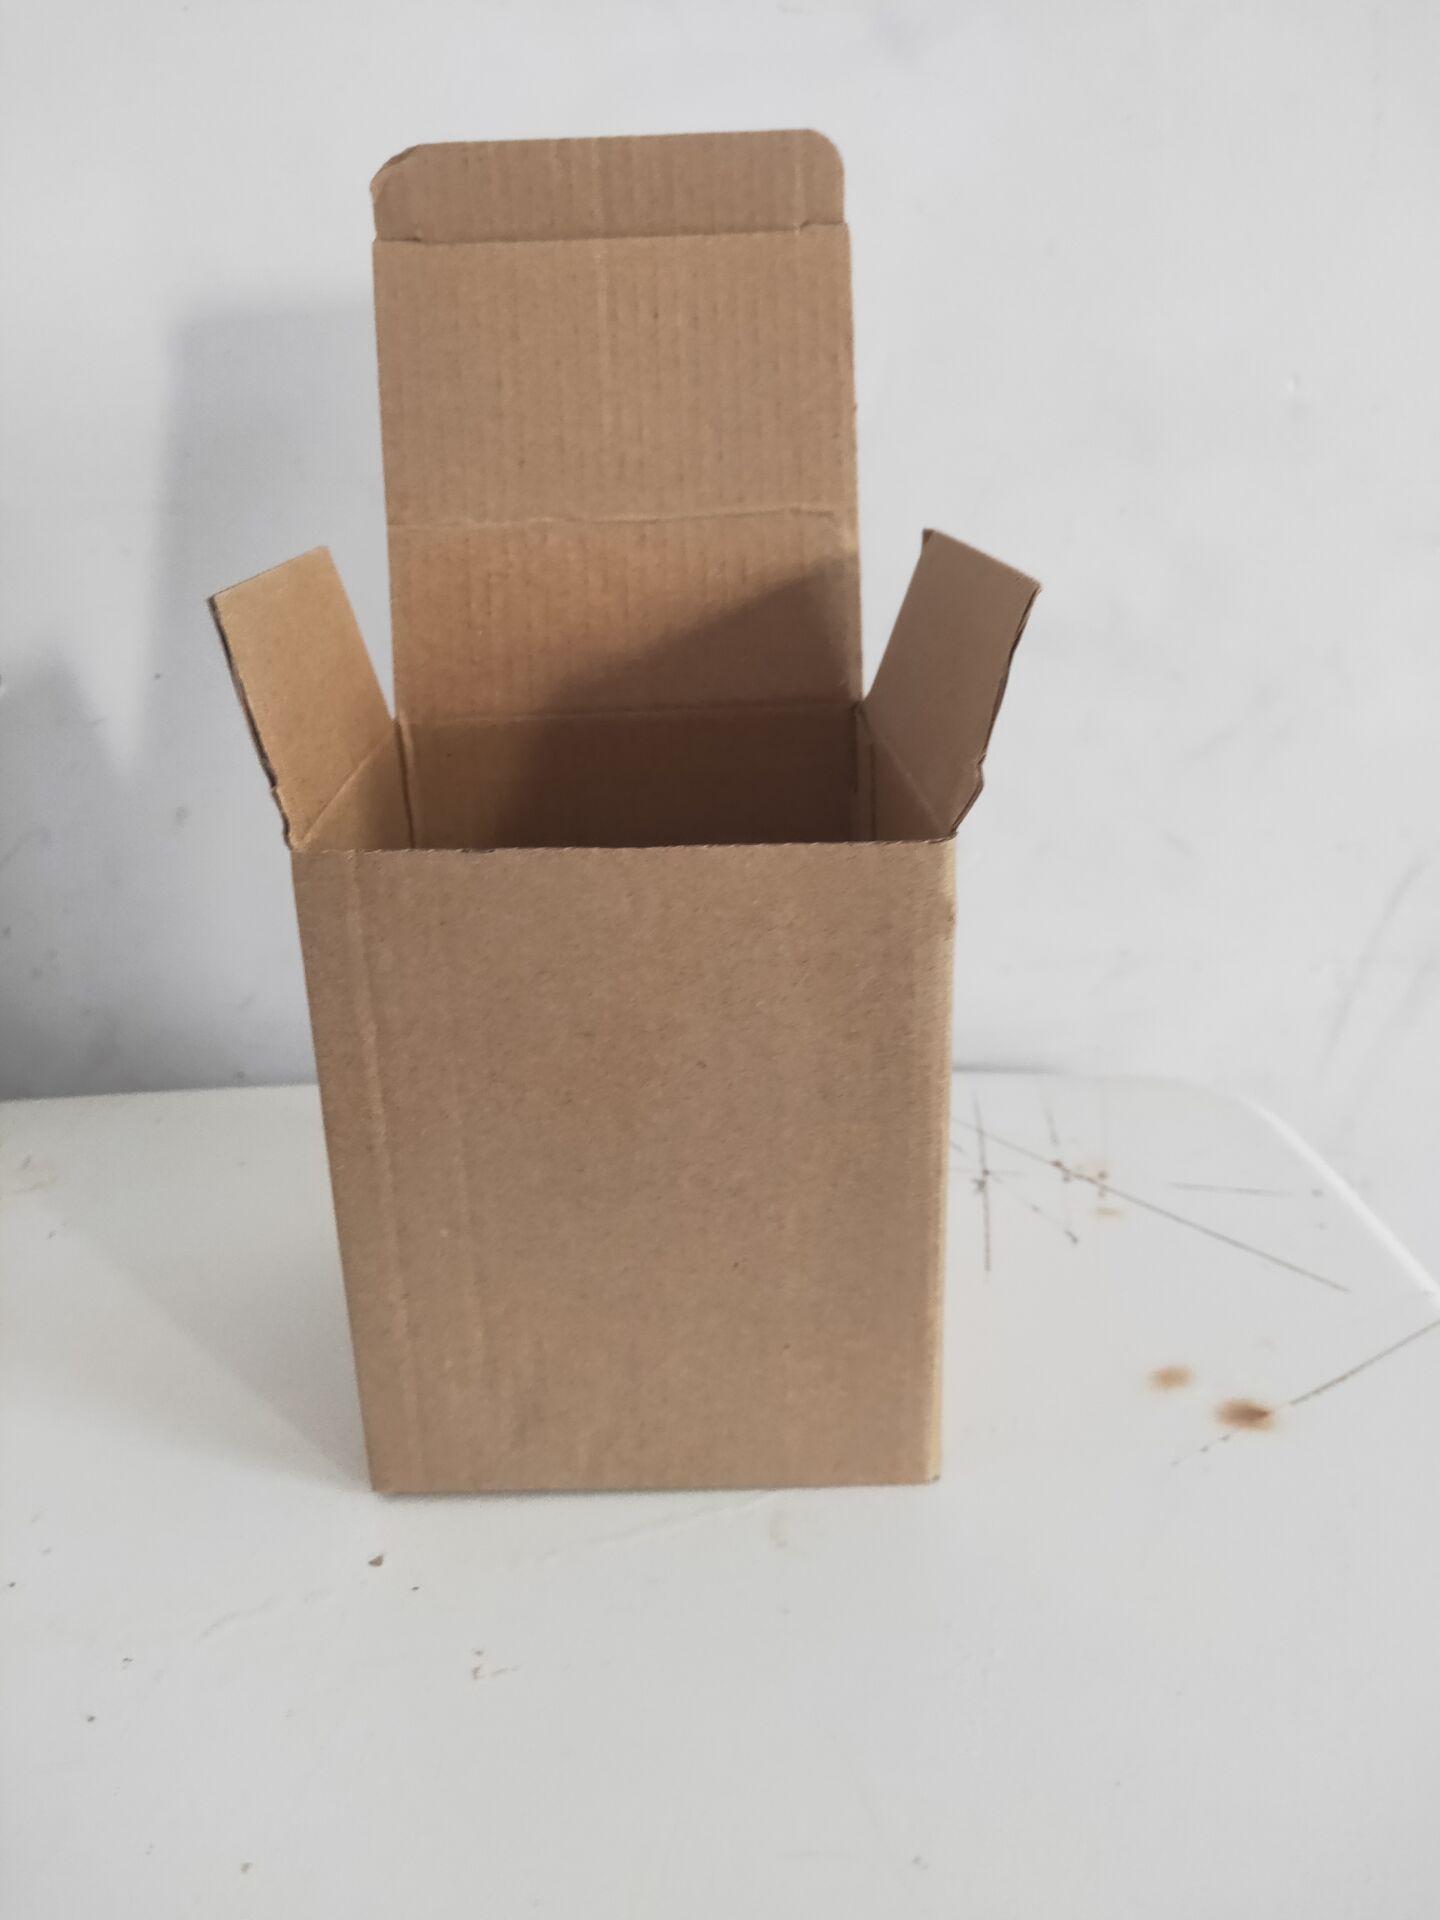 Картонные коробки / Упаковка из пенопласта Артикул 566095484804